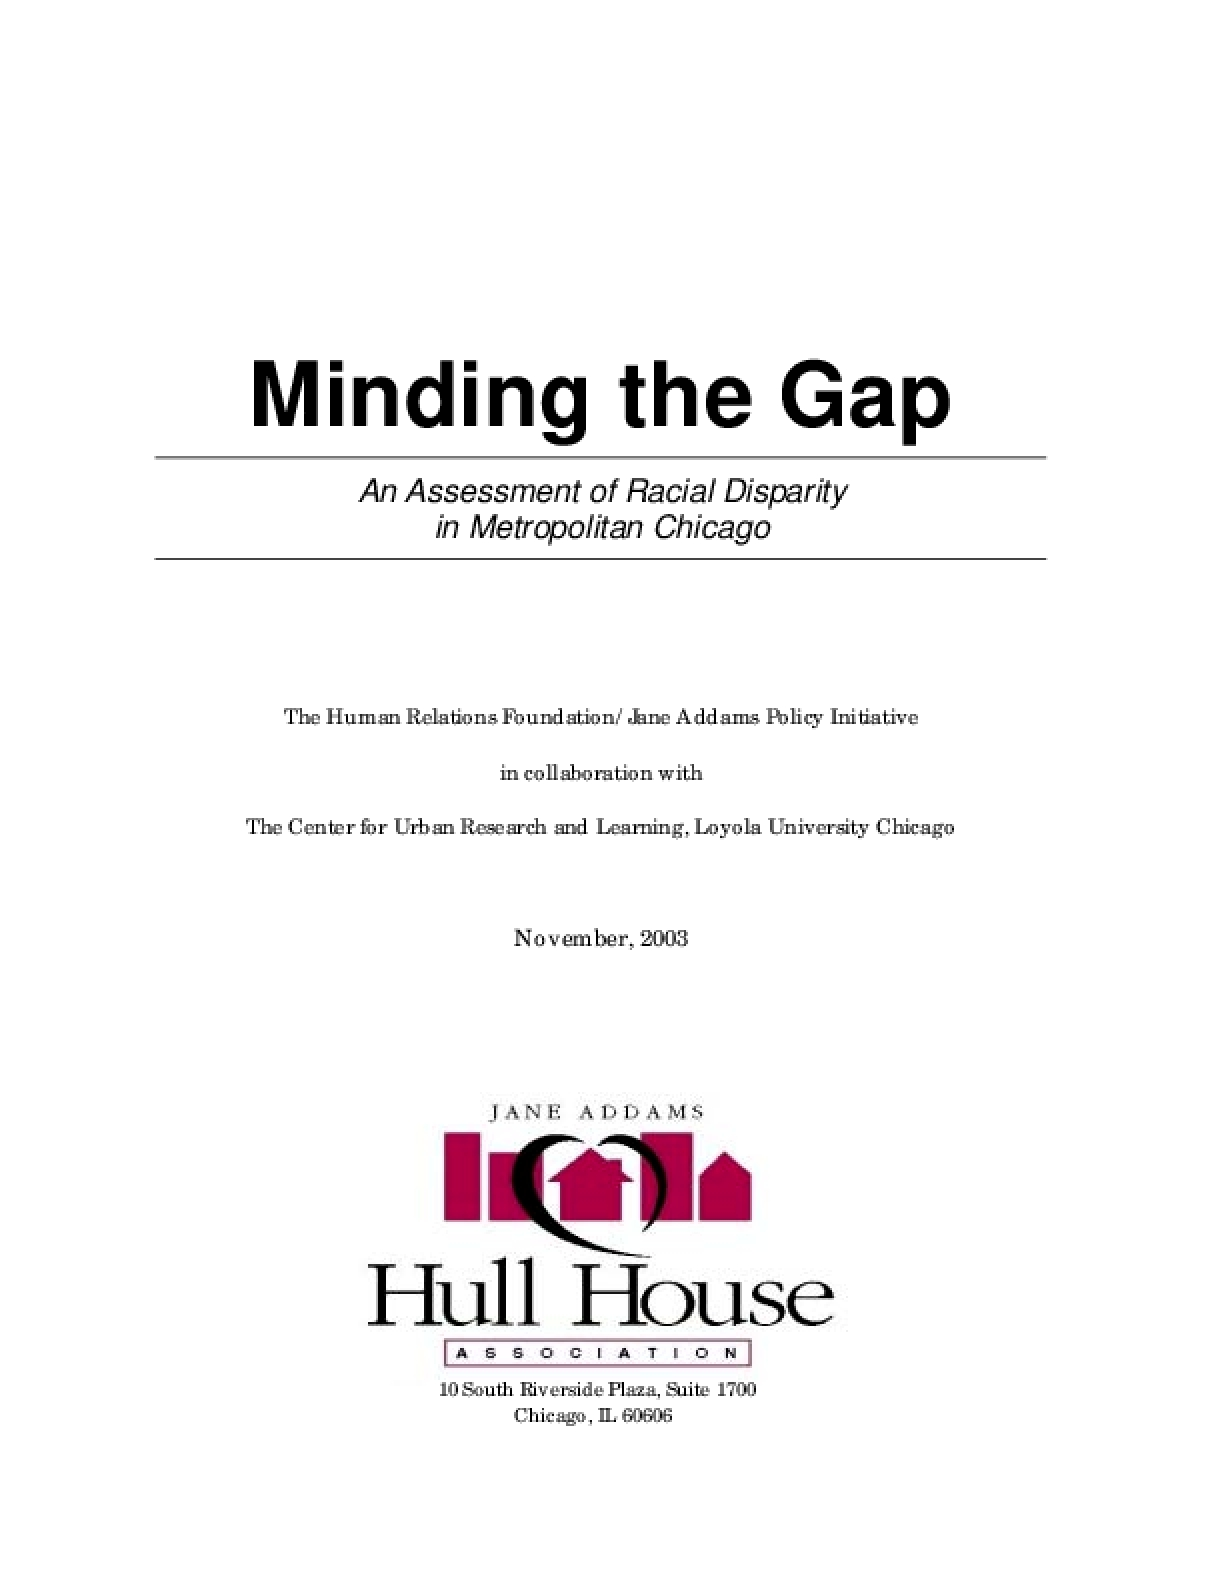 Minding the Gap: An Assessment of Racial Disparity in Metropolitan Chicago